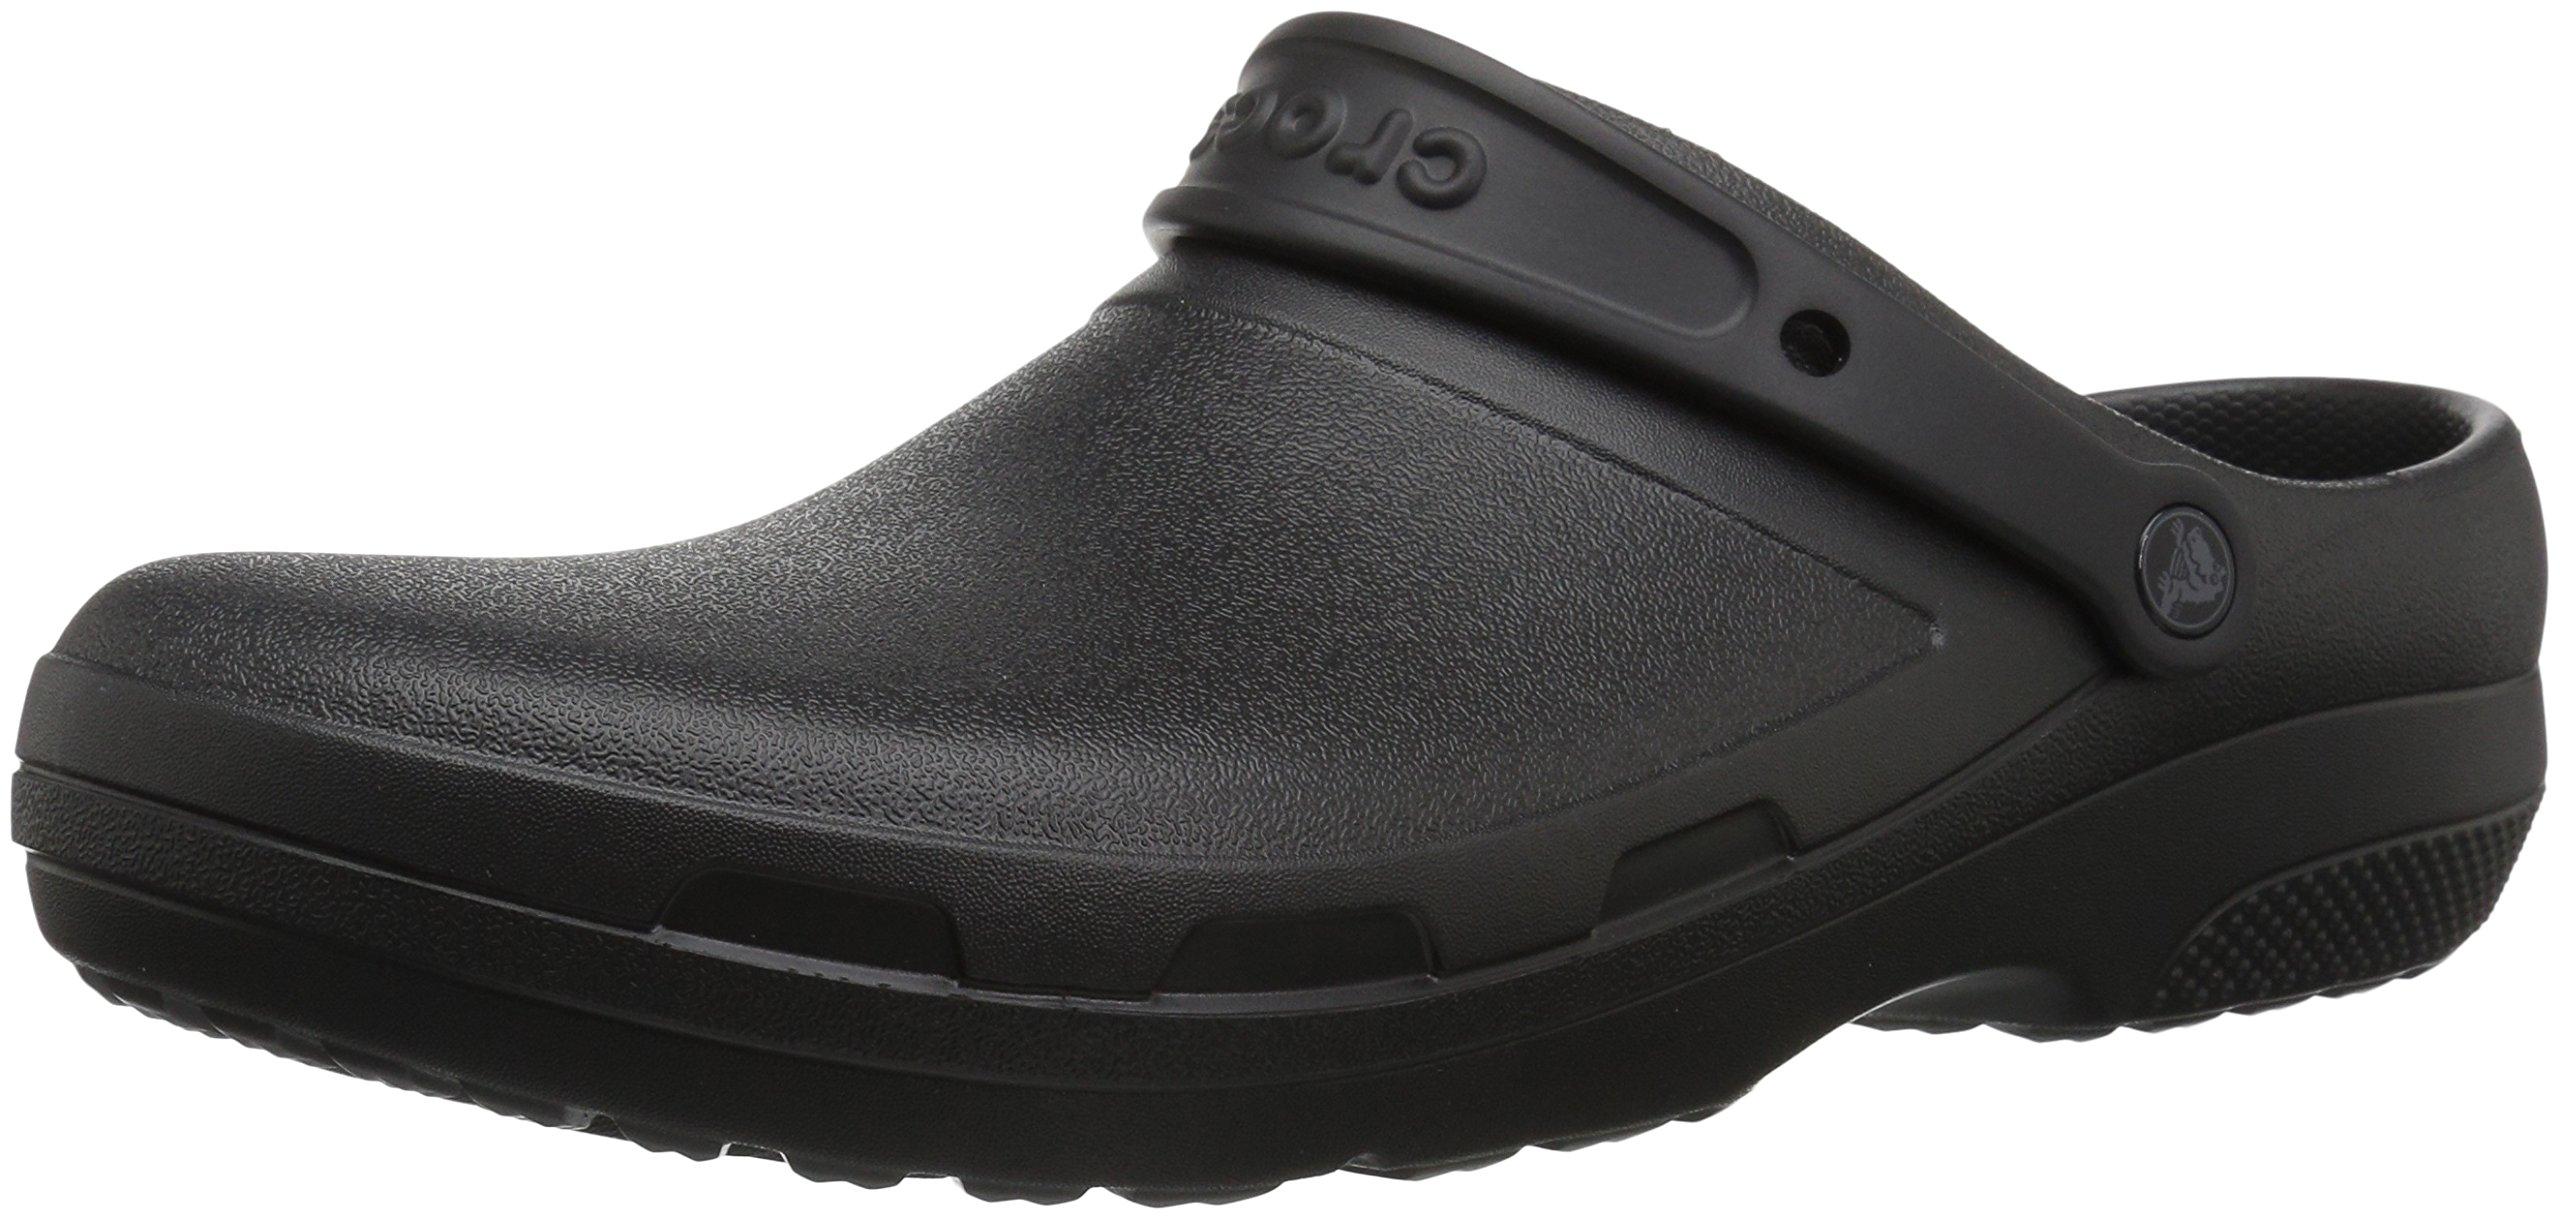 Crocs Specialist II Clog, Black, 10 US Men / 12 US Women by Crocs